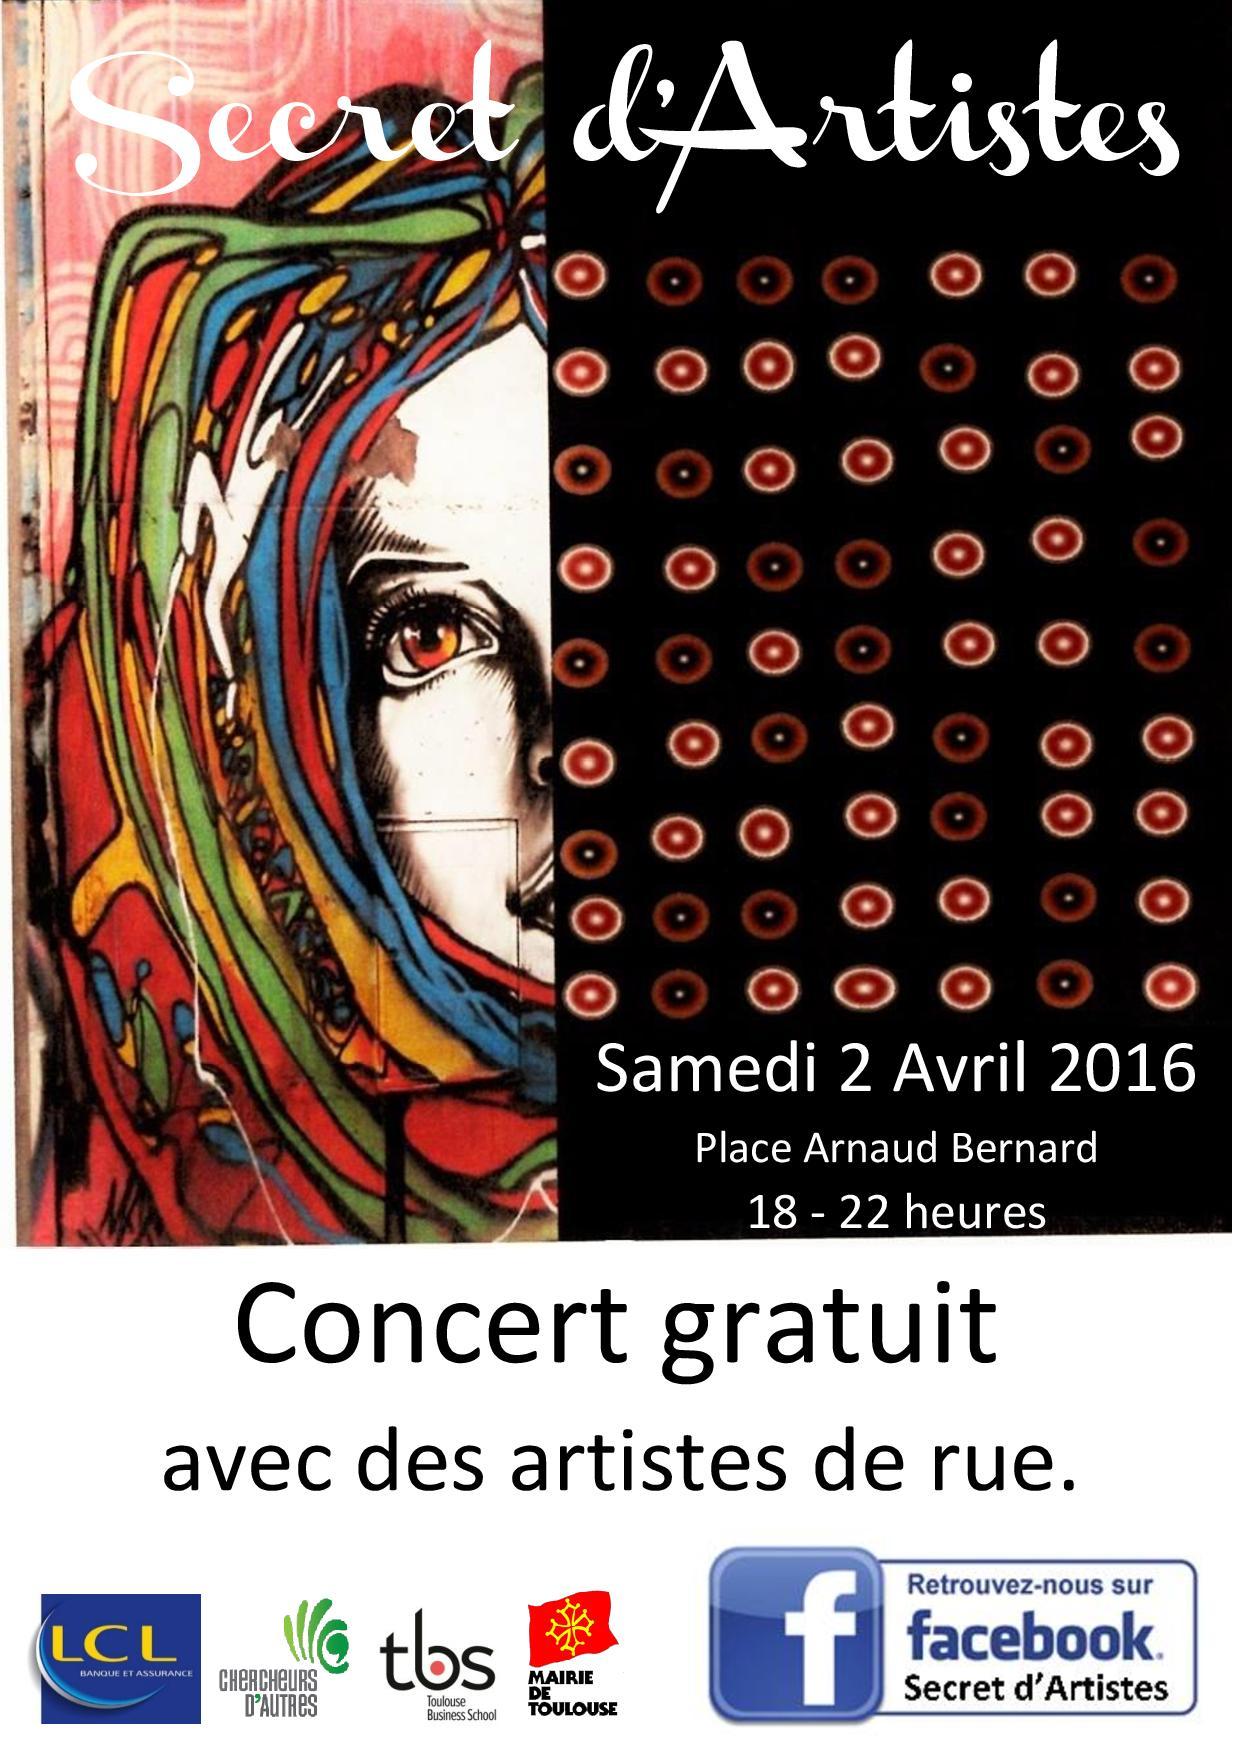 Secret d'Artistes Toulouse 2 avril 2016 Arnaud Bernard Gratuit